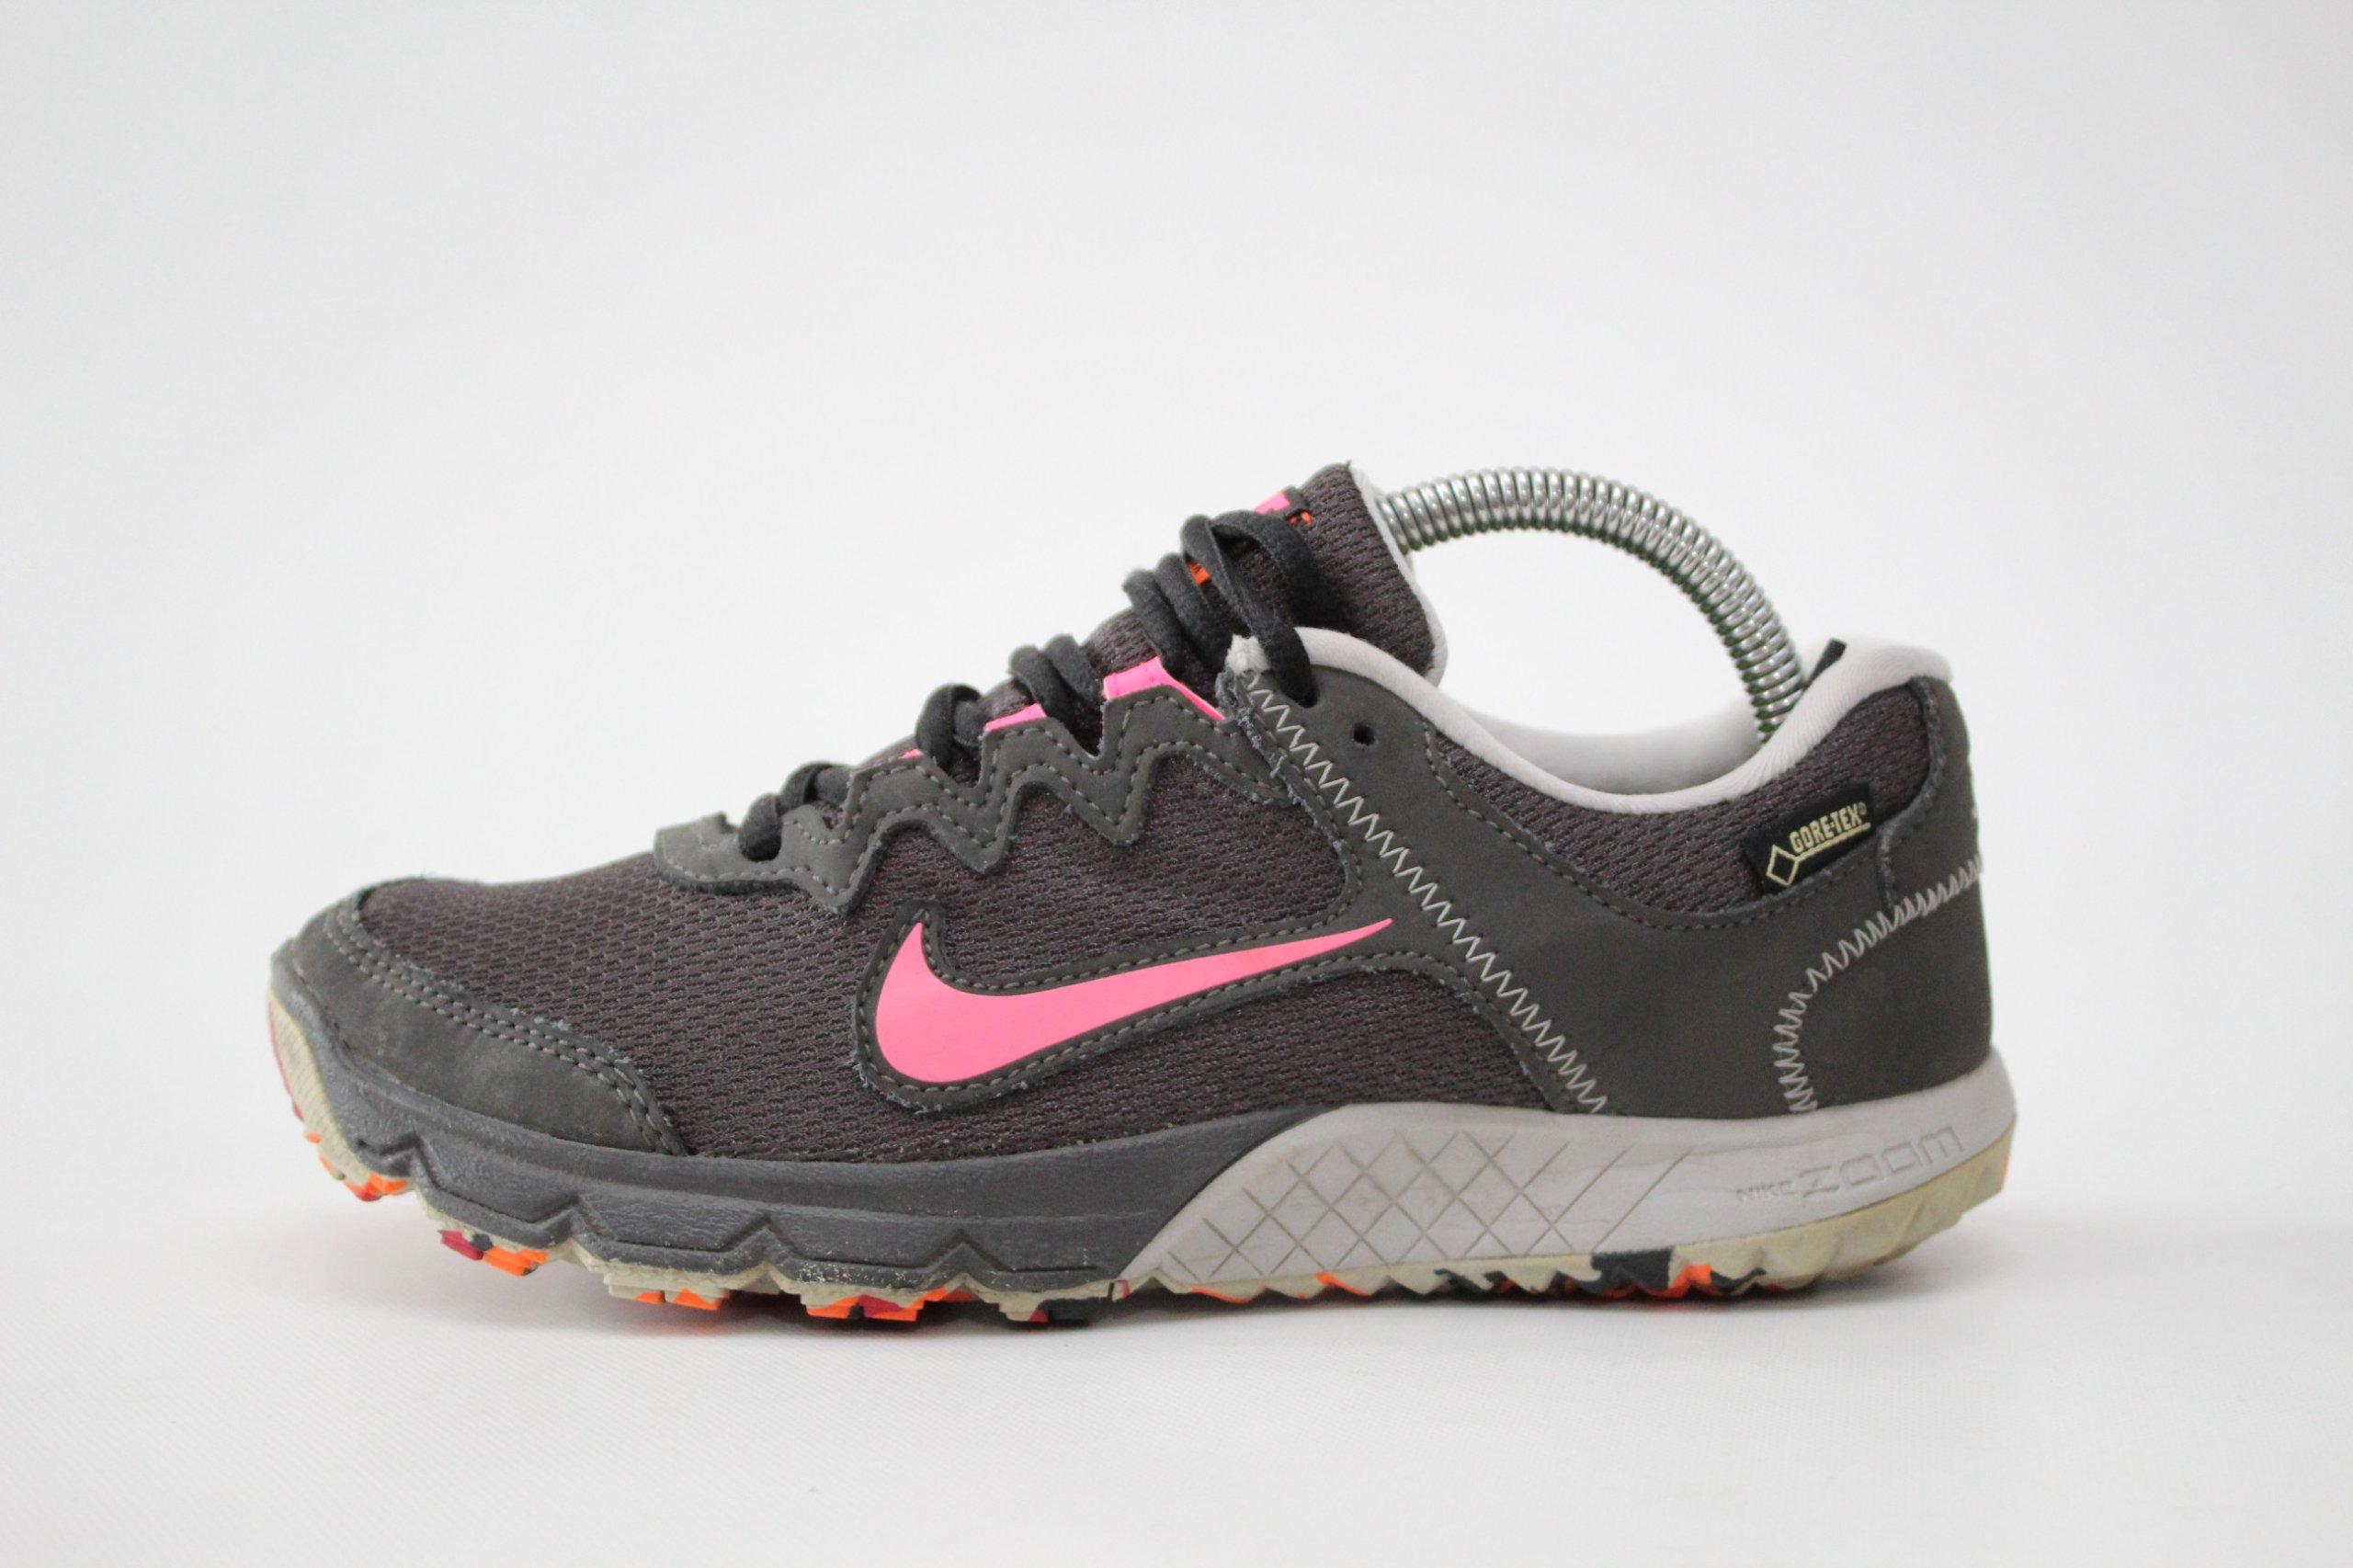 Buty damskie Nike Air Pegasus 25 GORE TEX, r. 38